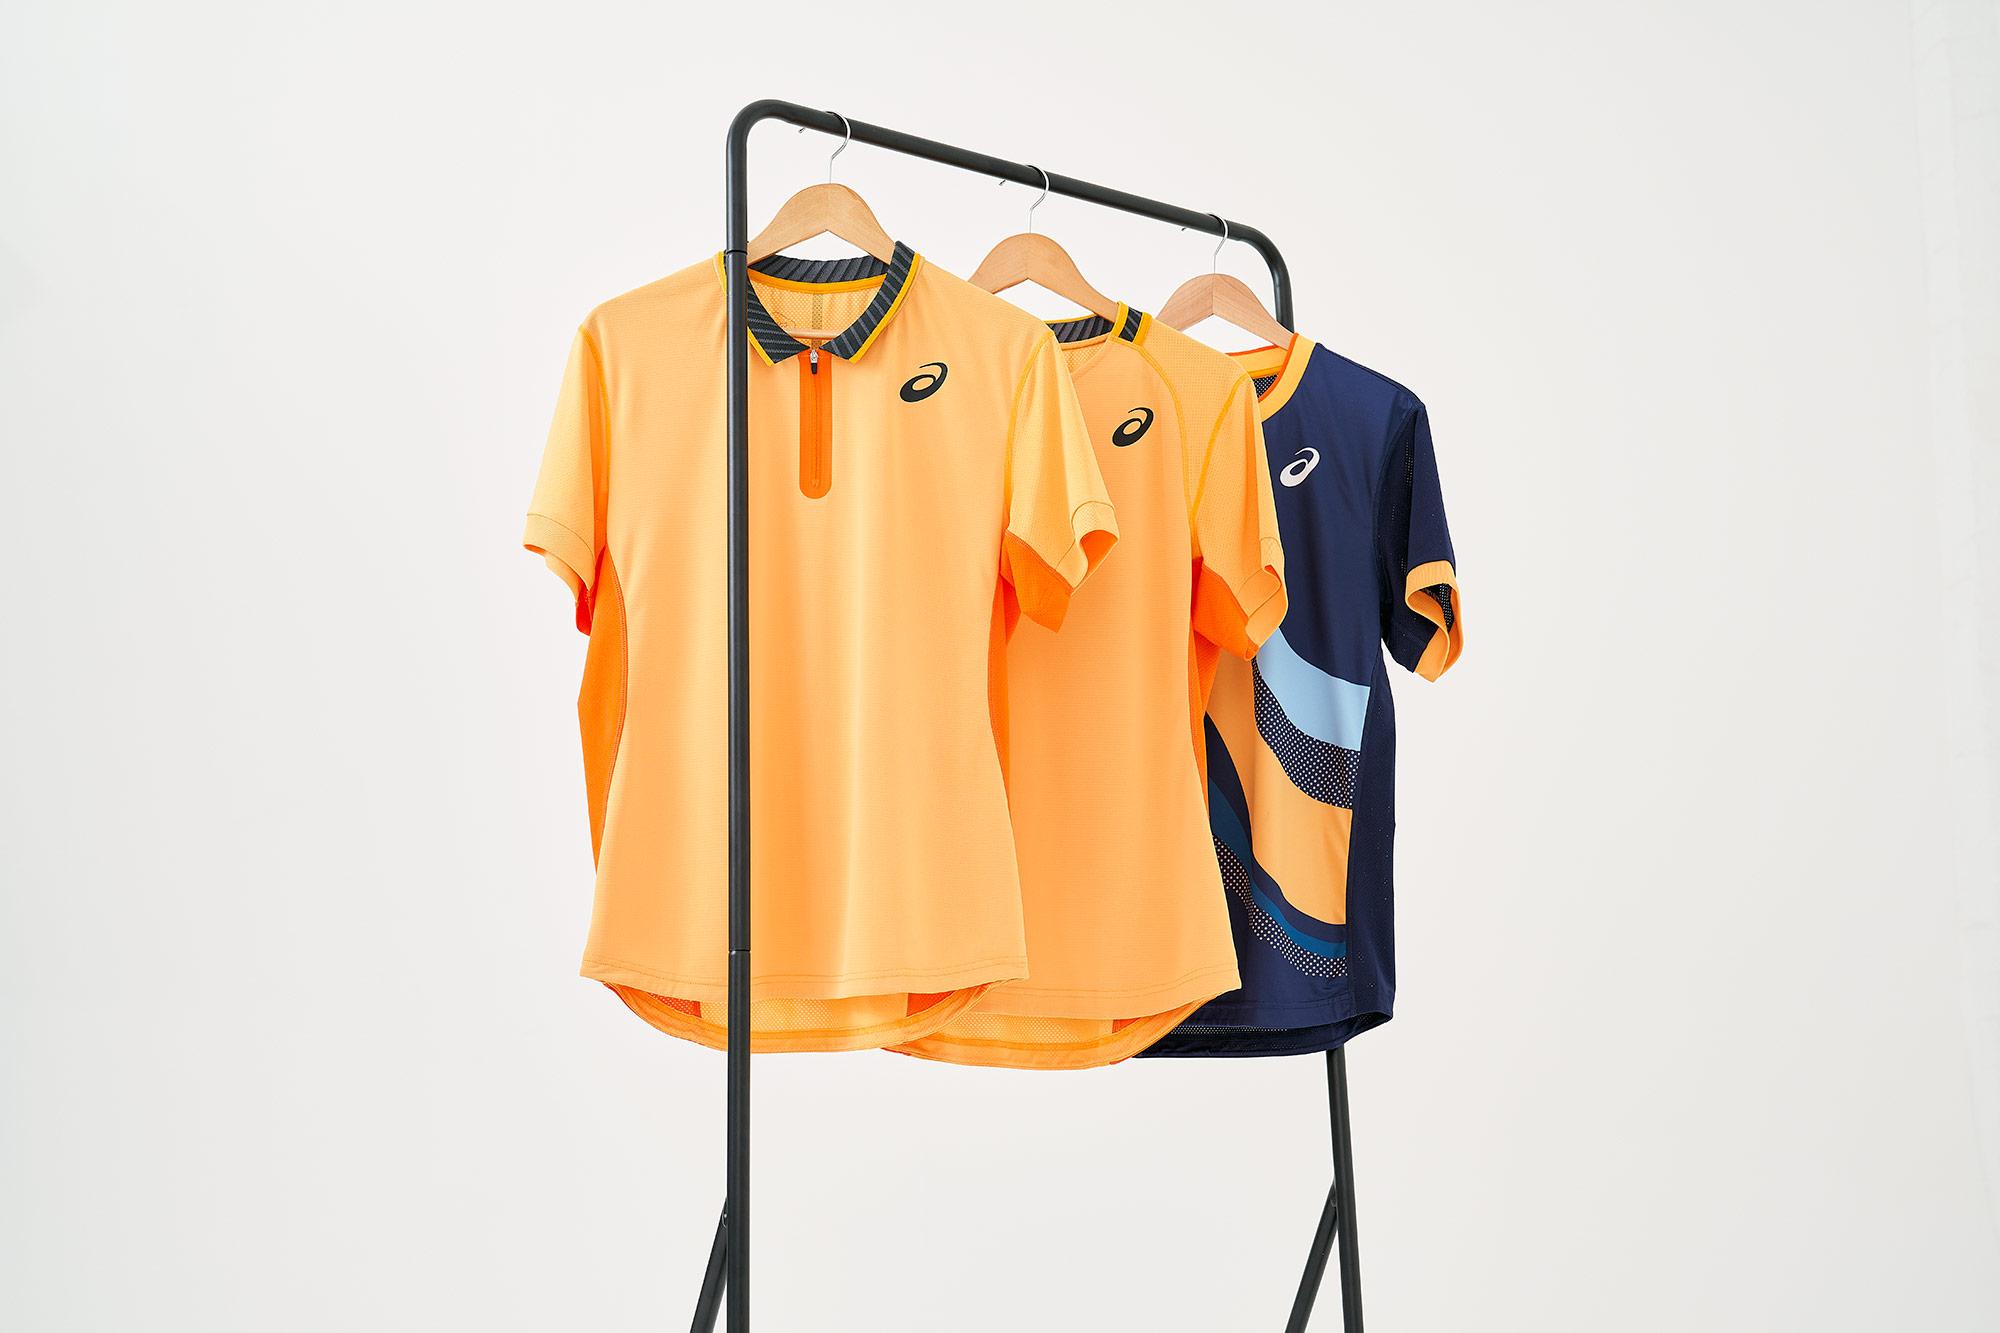 asics tennis clothing photographed in studio using profoto lighting